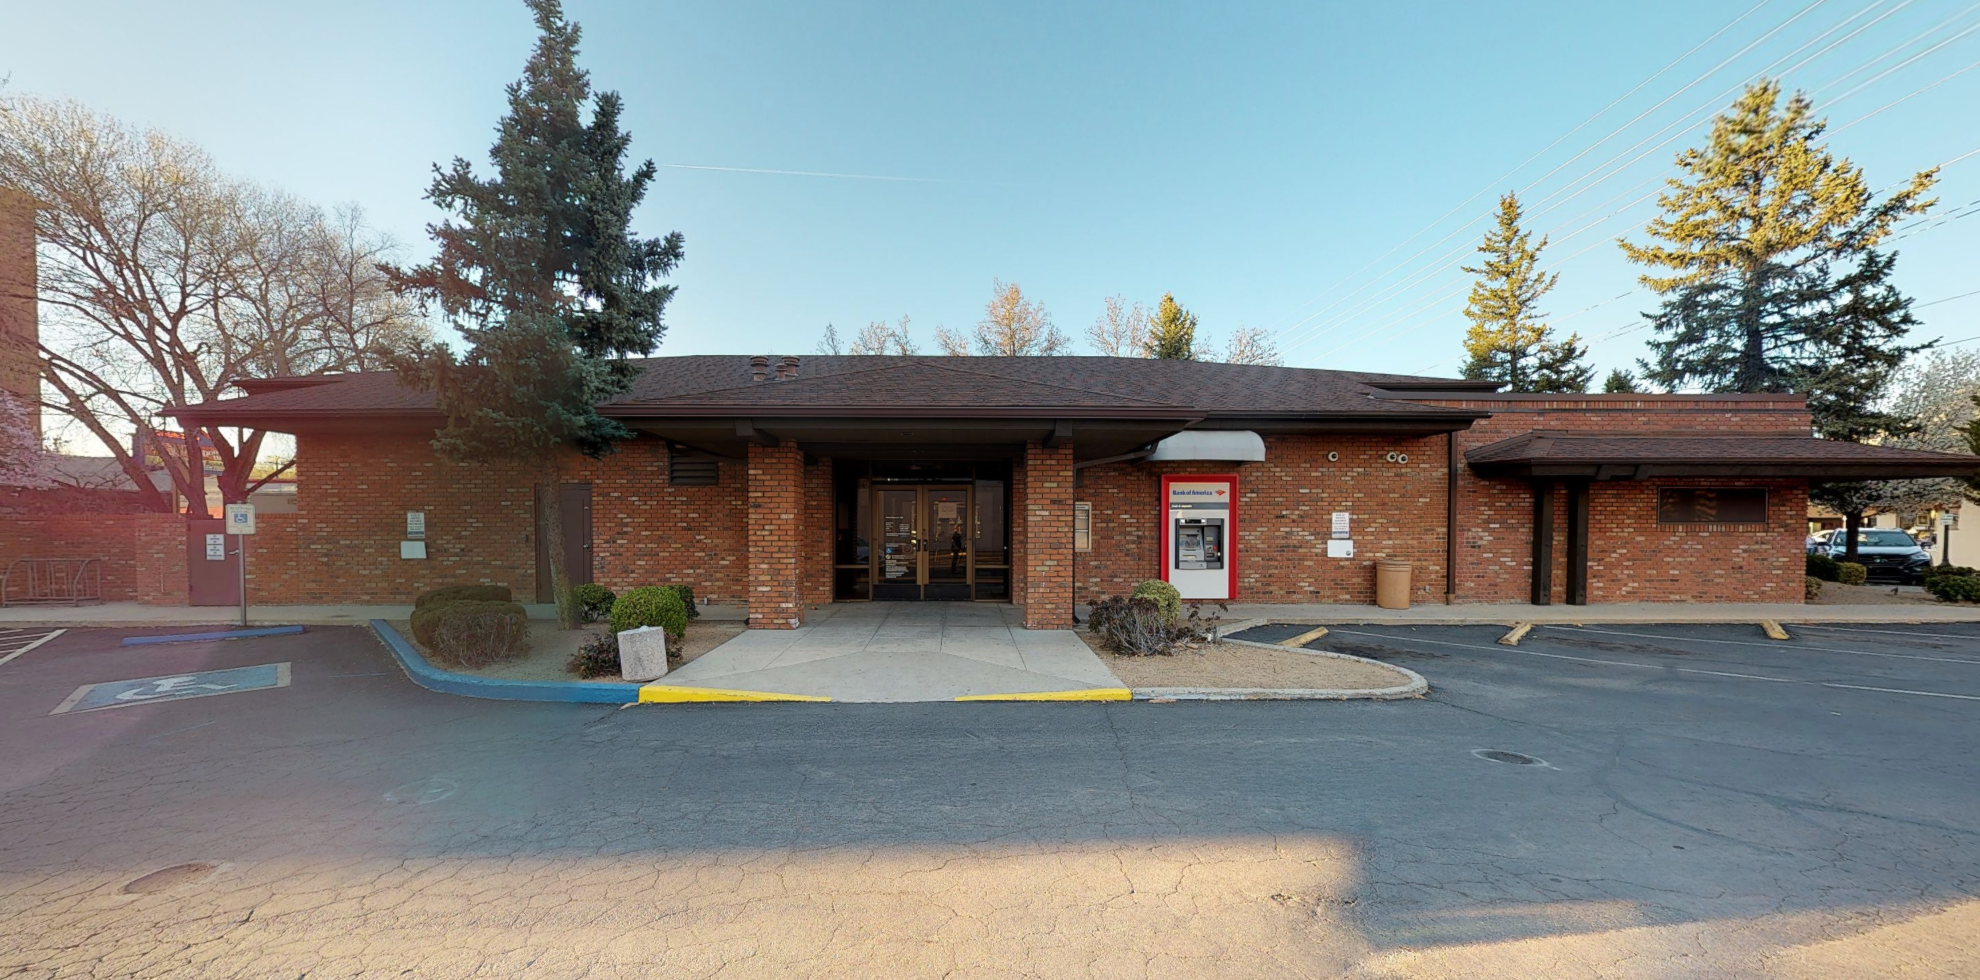 Bank of America financial center with drive-thru ATM   301 W Gurley St, Prescott, AZ 86301